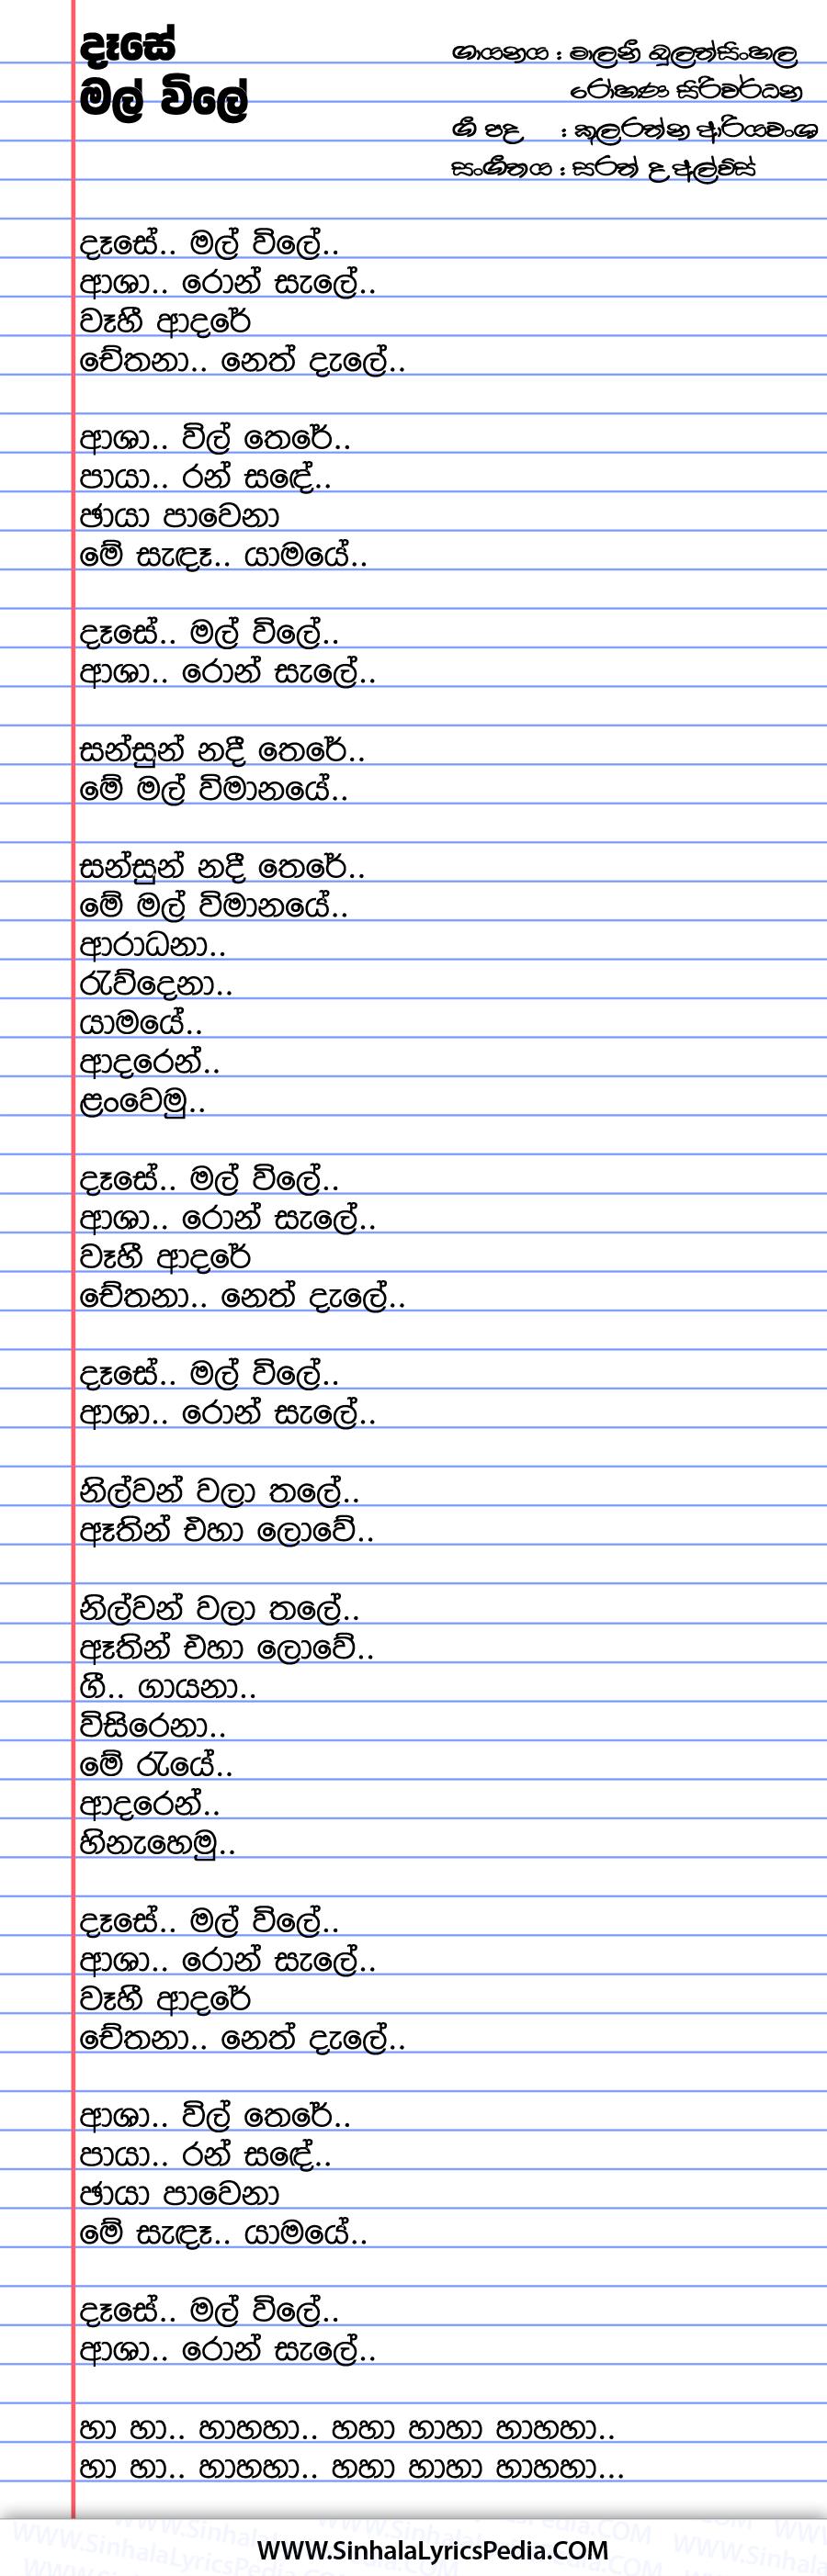 Dase Mal Vile Asha Ron Sale Song Lyrics